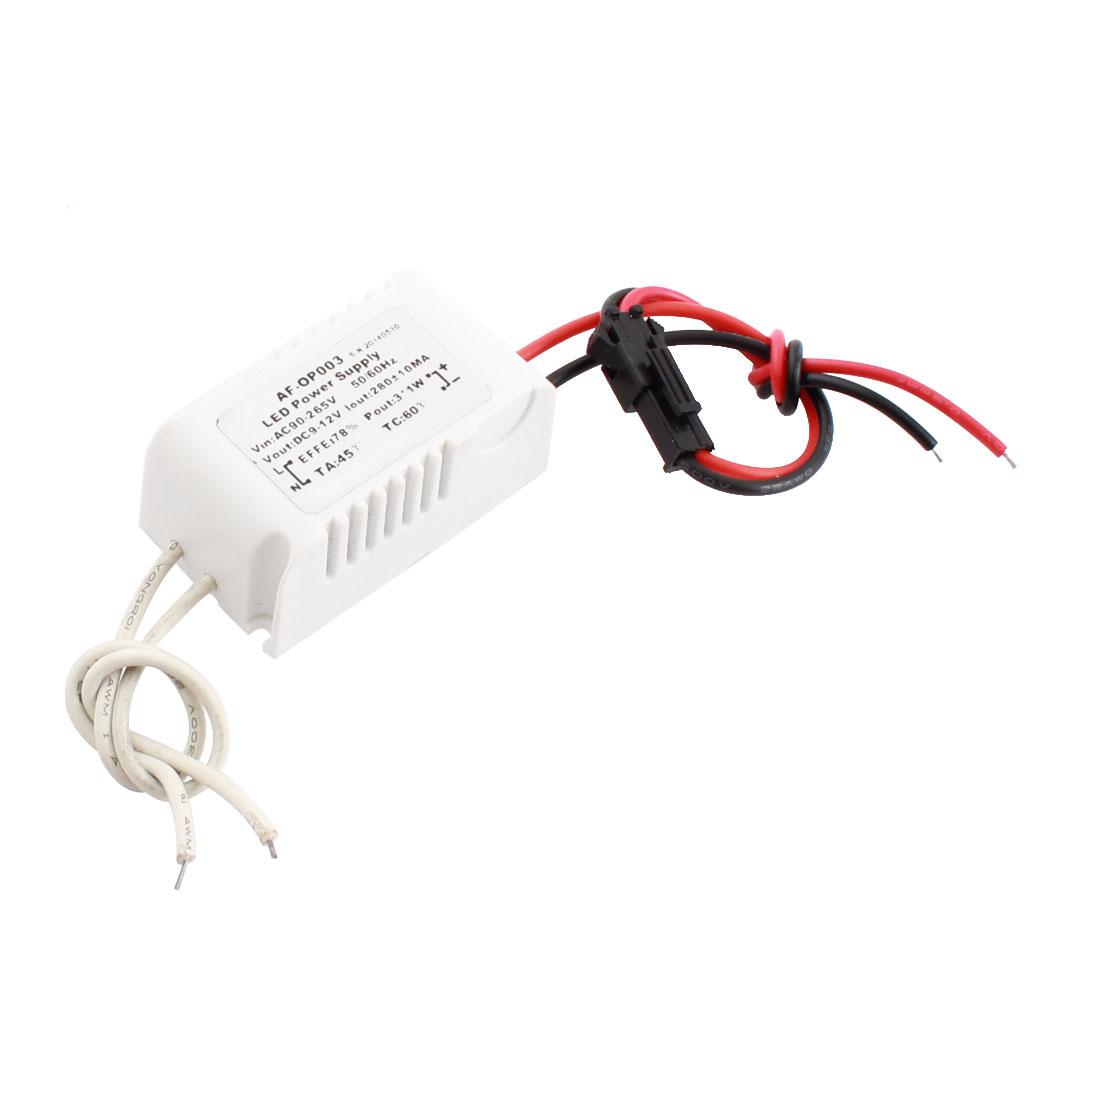 AC 90-265V Input DC 9-12V Output White Power Supply Driver for 3x1W LED Light